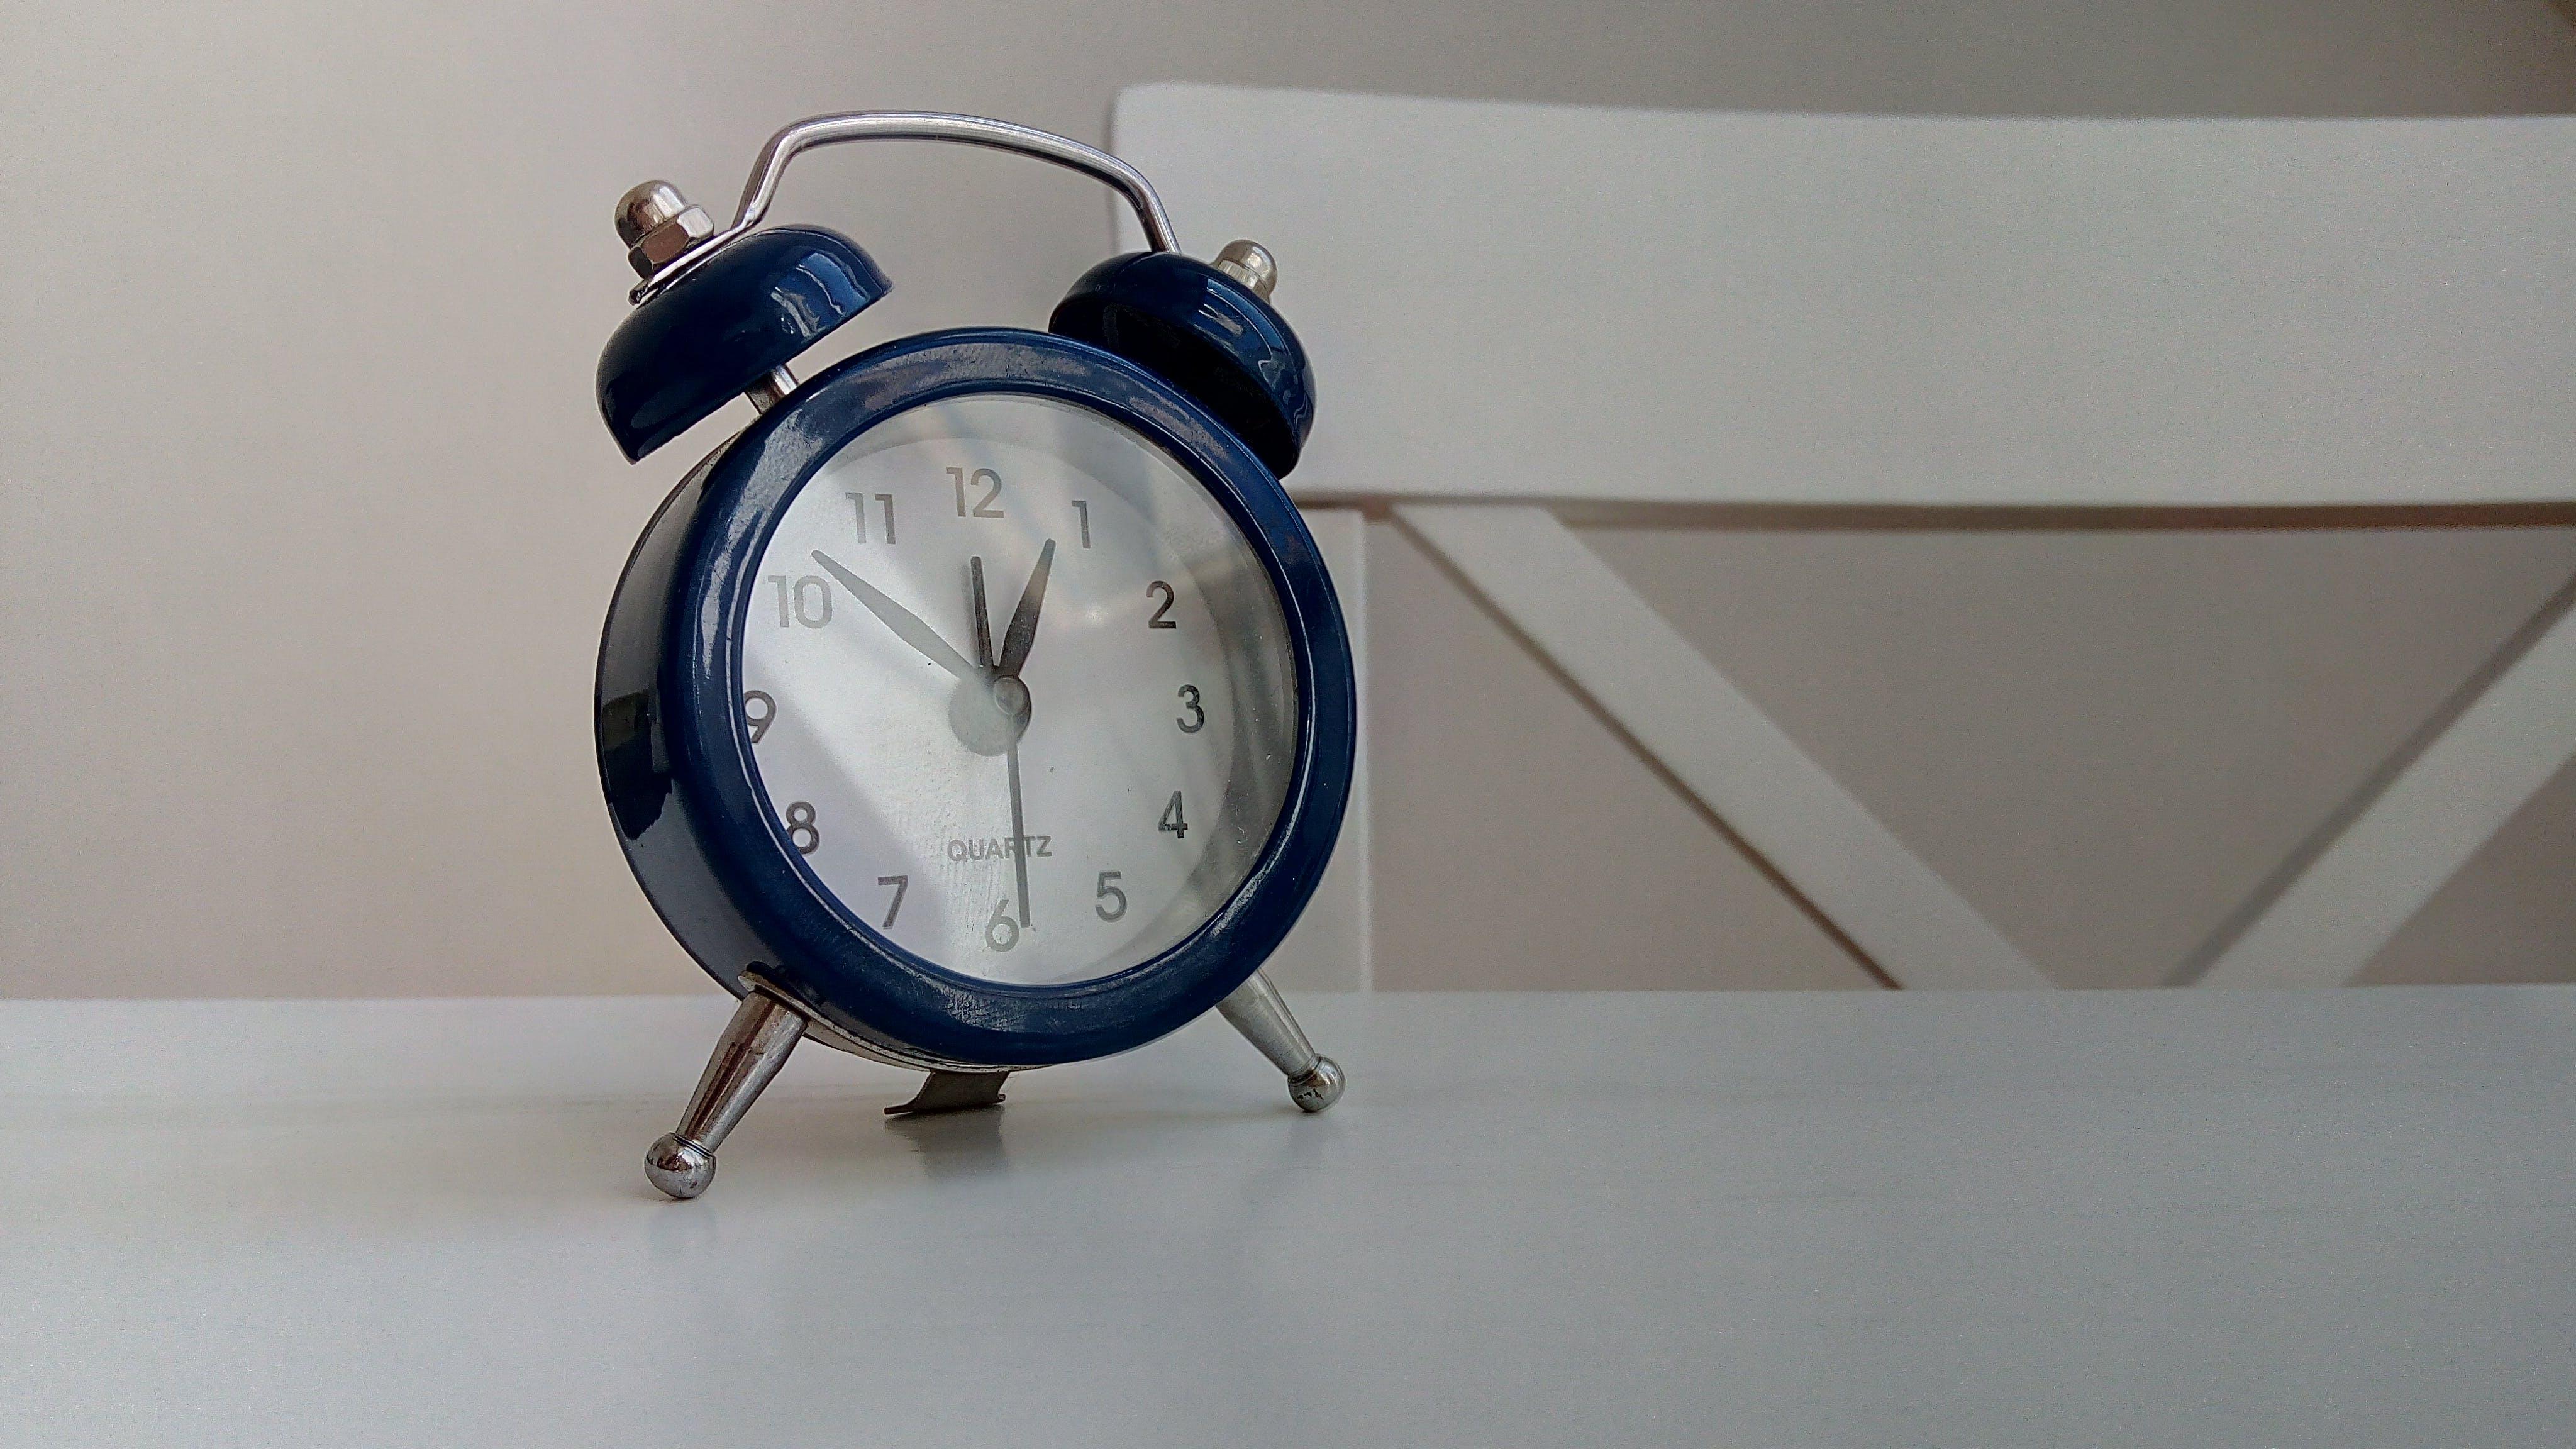 Free stock photo of alarm clock, business, clock, light reflections